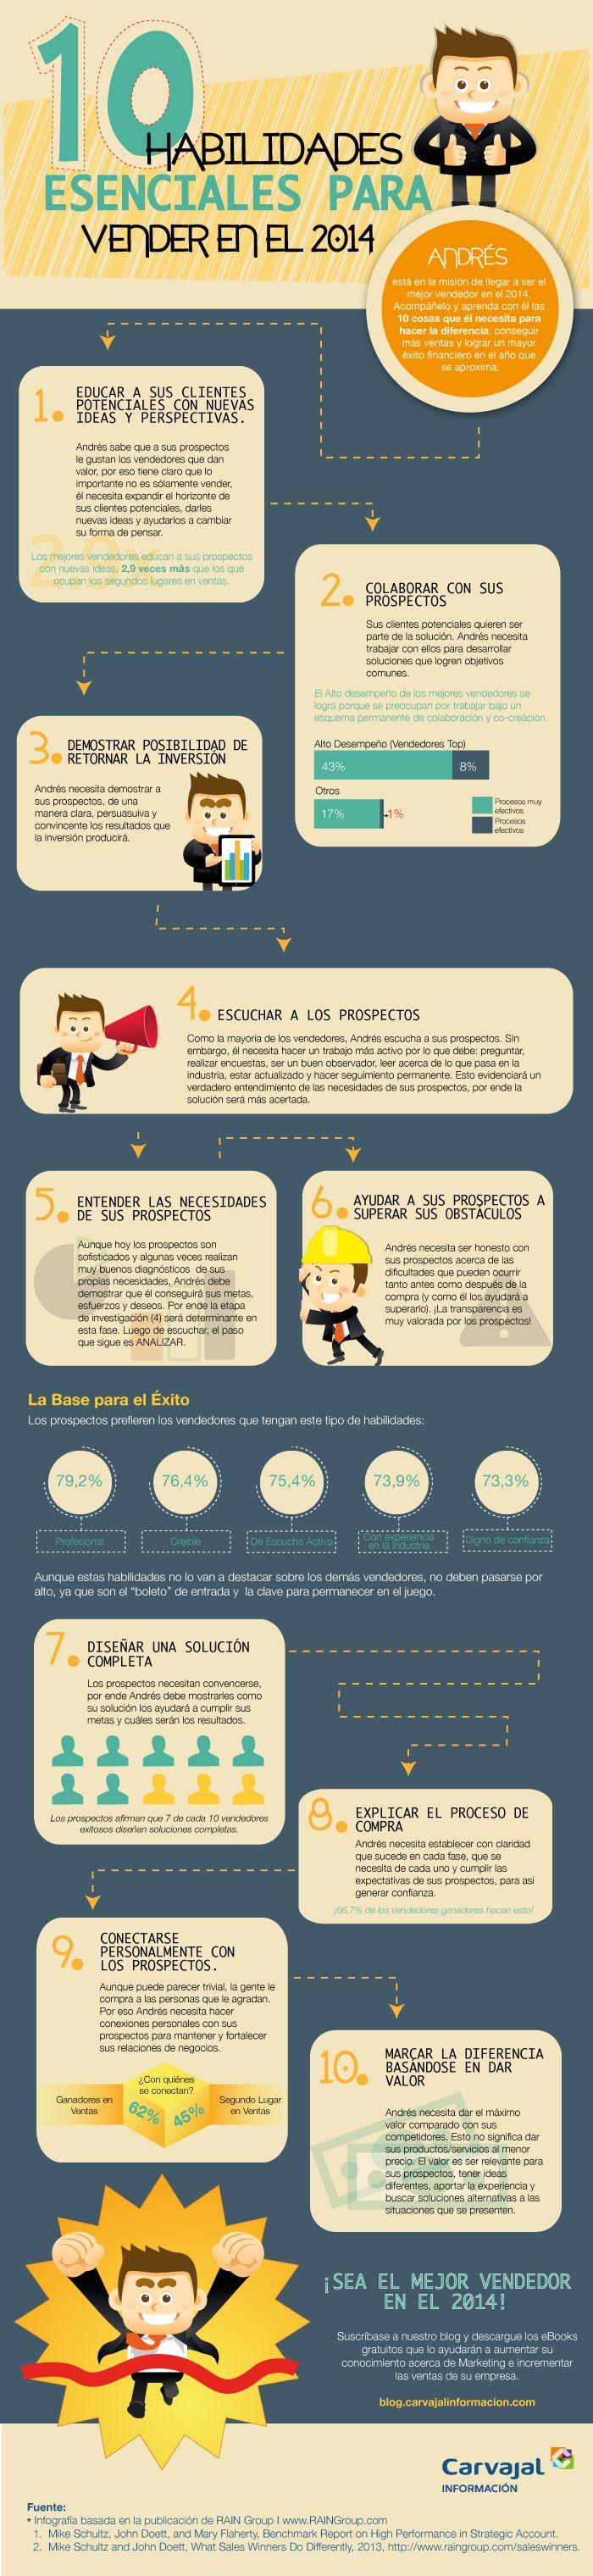 10 habilidades esenciales para vender #infografia #infographic #marketing vía: @PublicarComunid